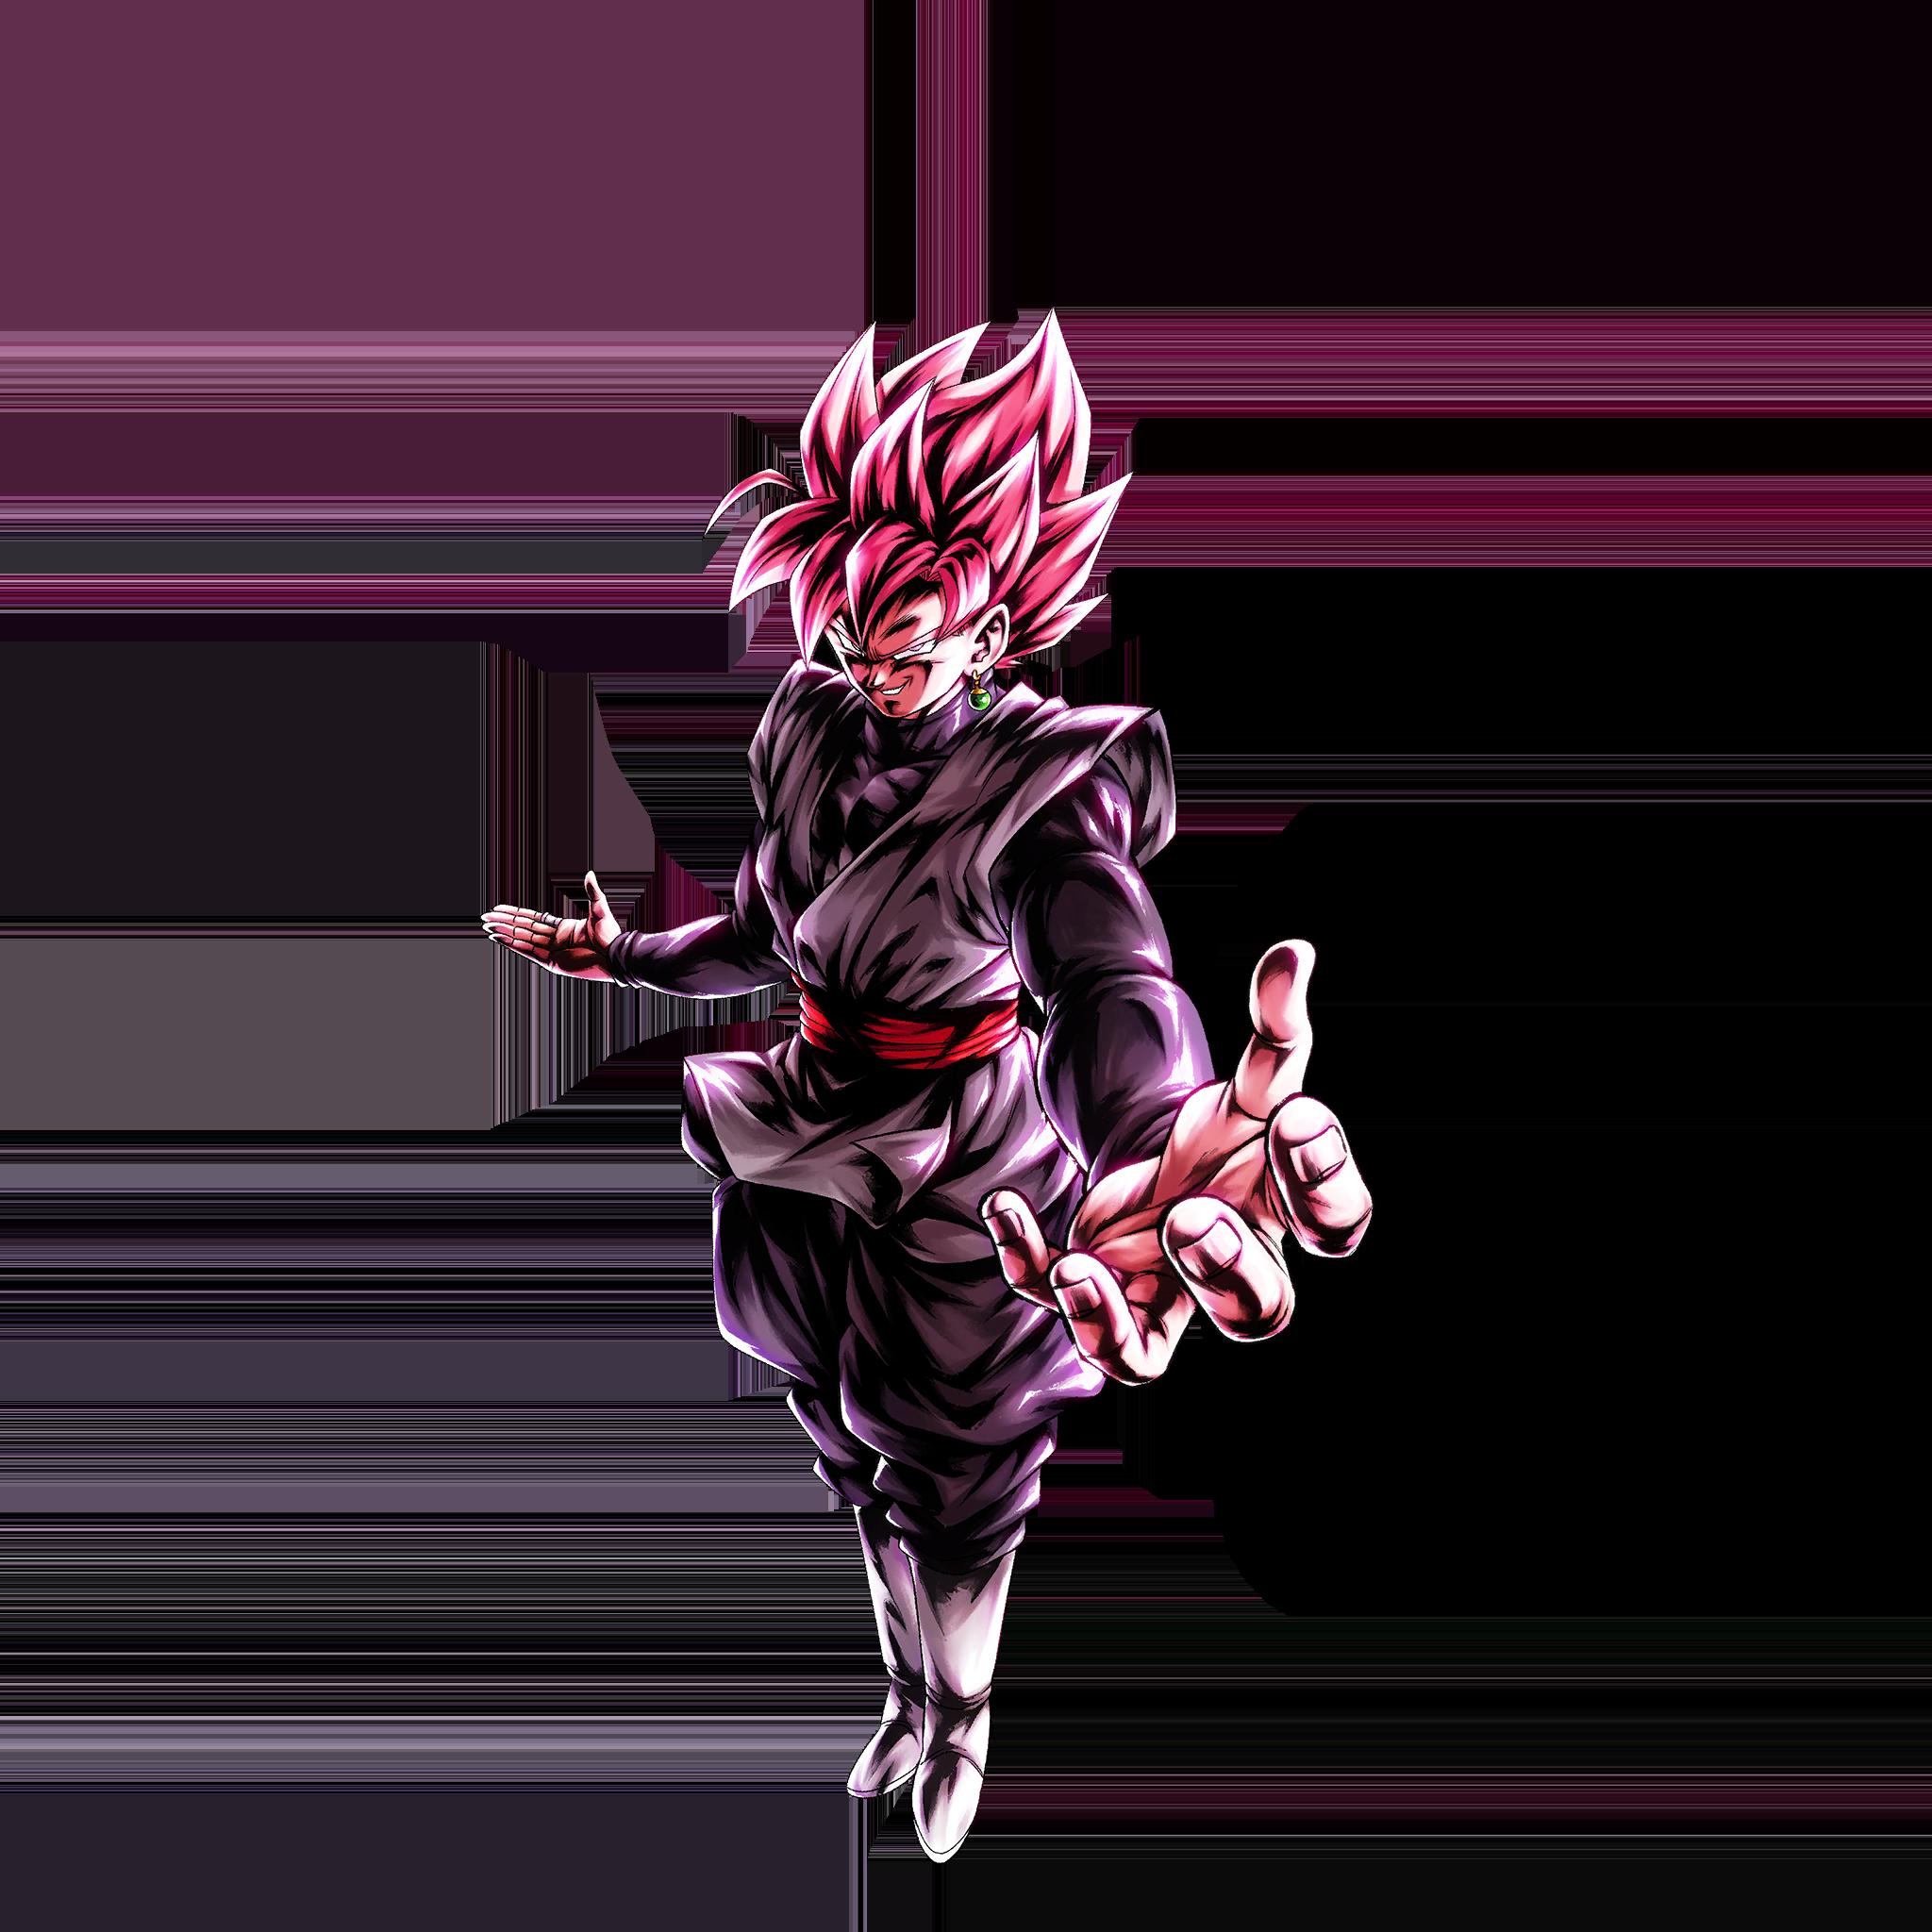 Goku Black Rose Render Db Legends By Maxiuchiha22 On Deviantart Goku Black Dragon Ball Super Goku Anime Dragon Ball Super